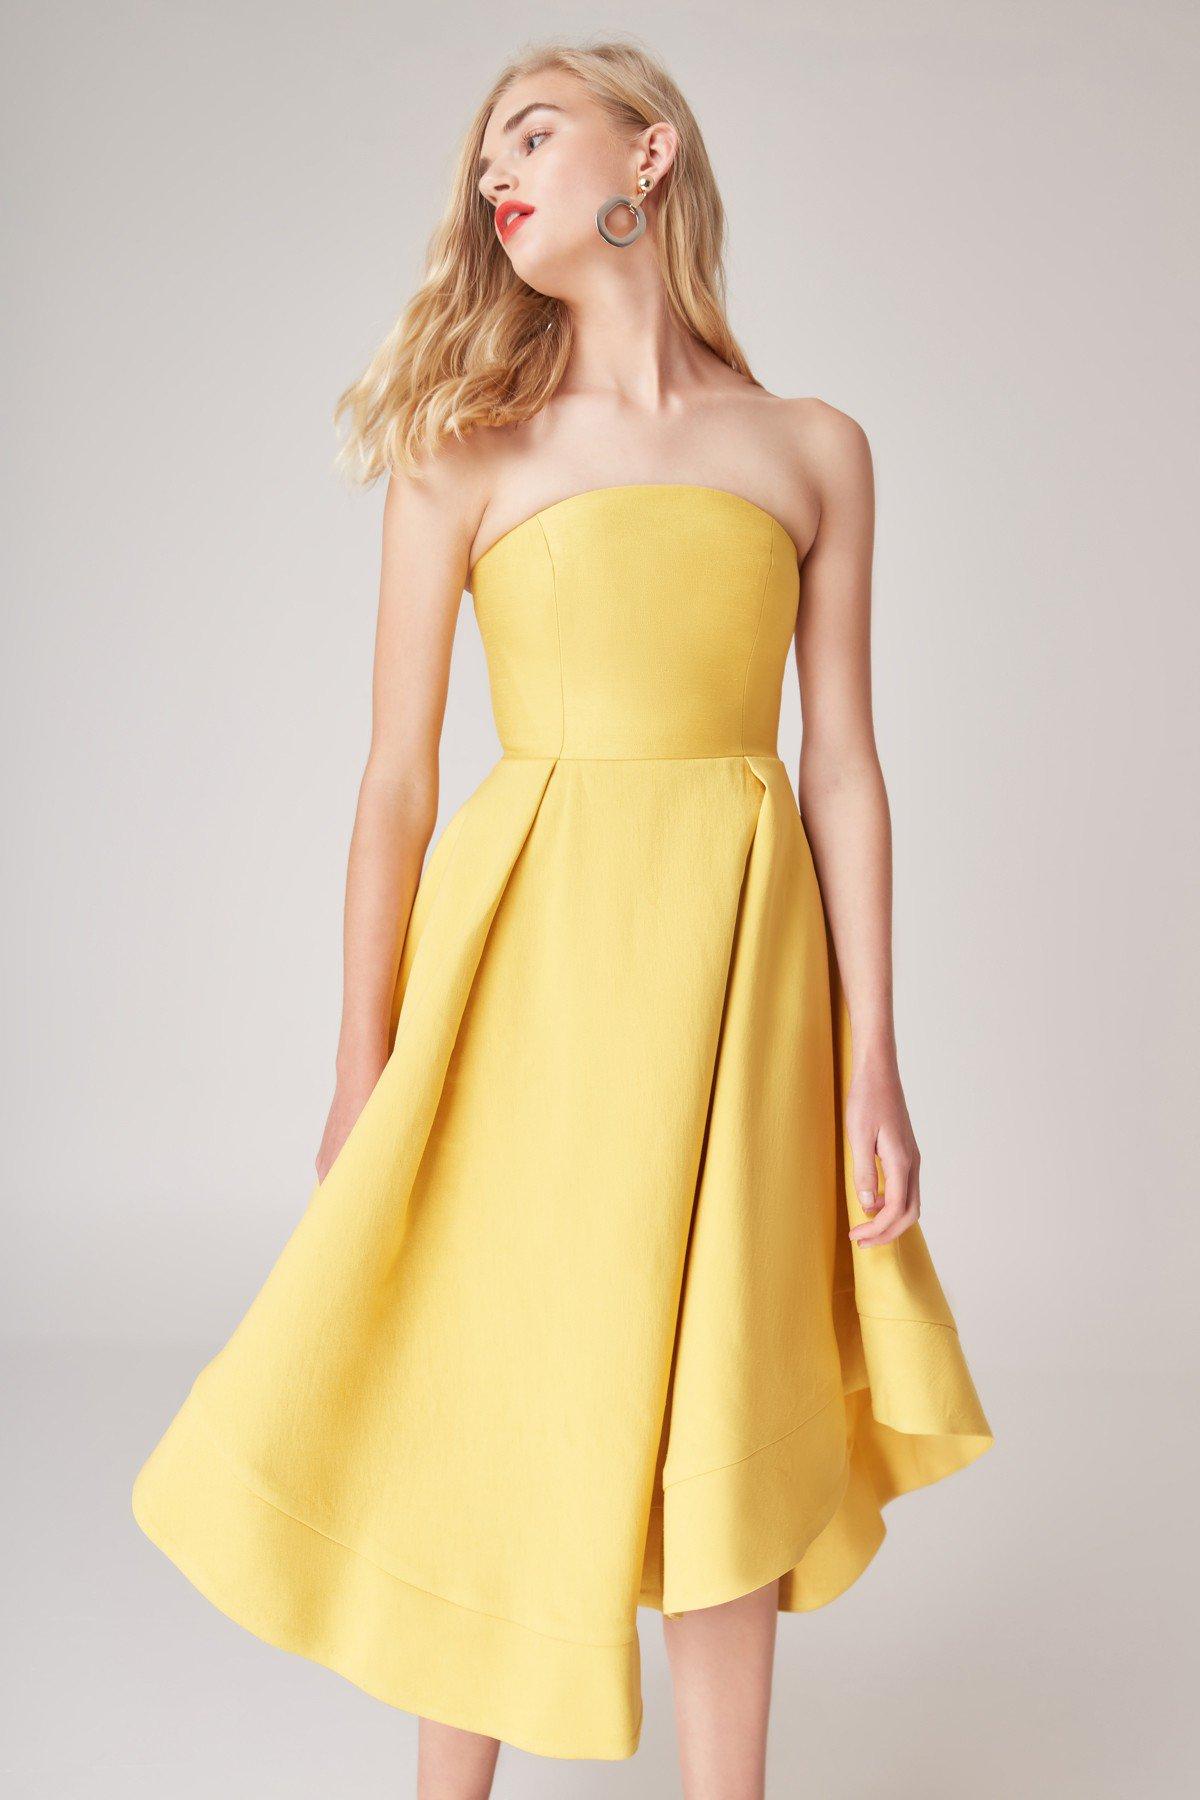 Shop C/MEO Making Waves Dress.